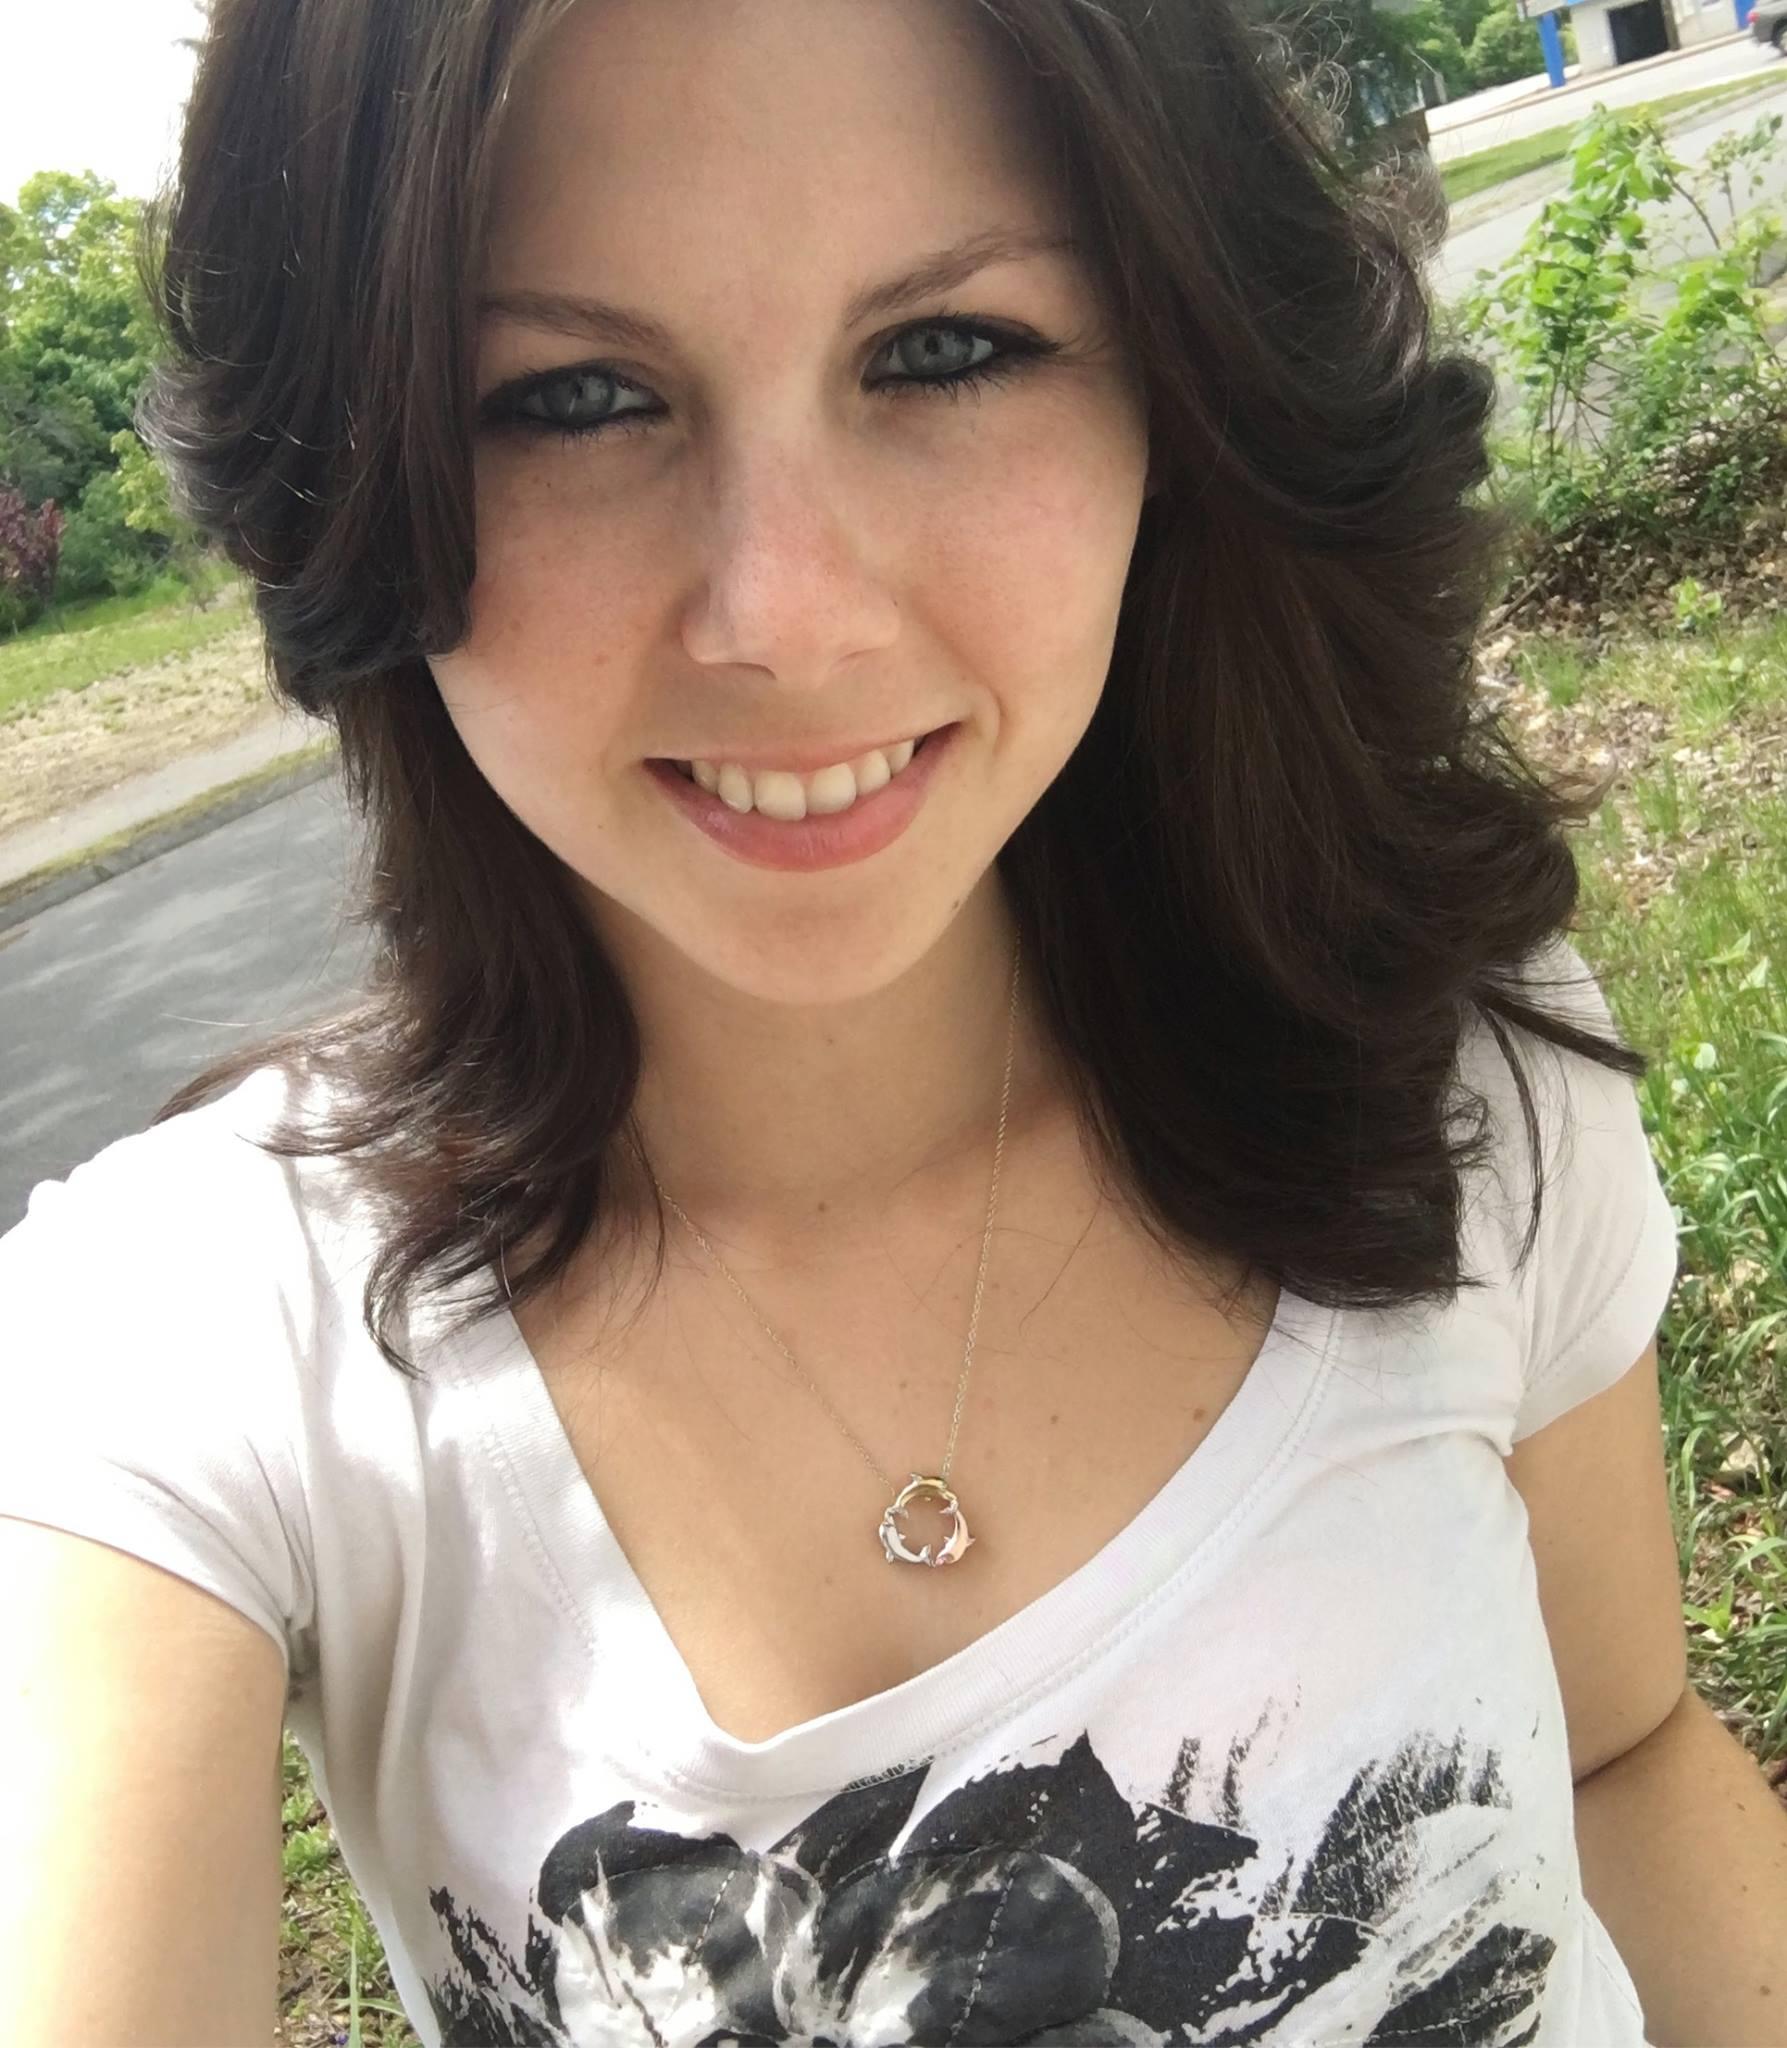 Angela Mastrogiacomo